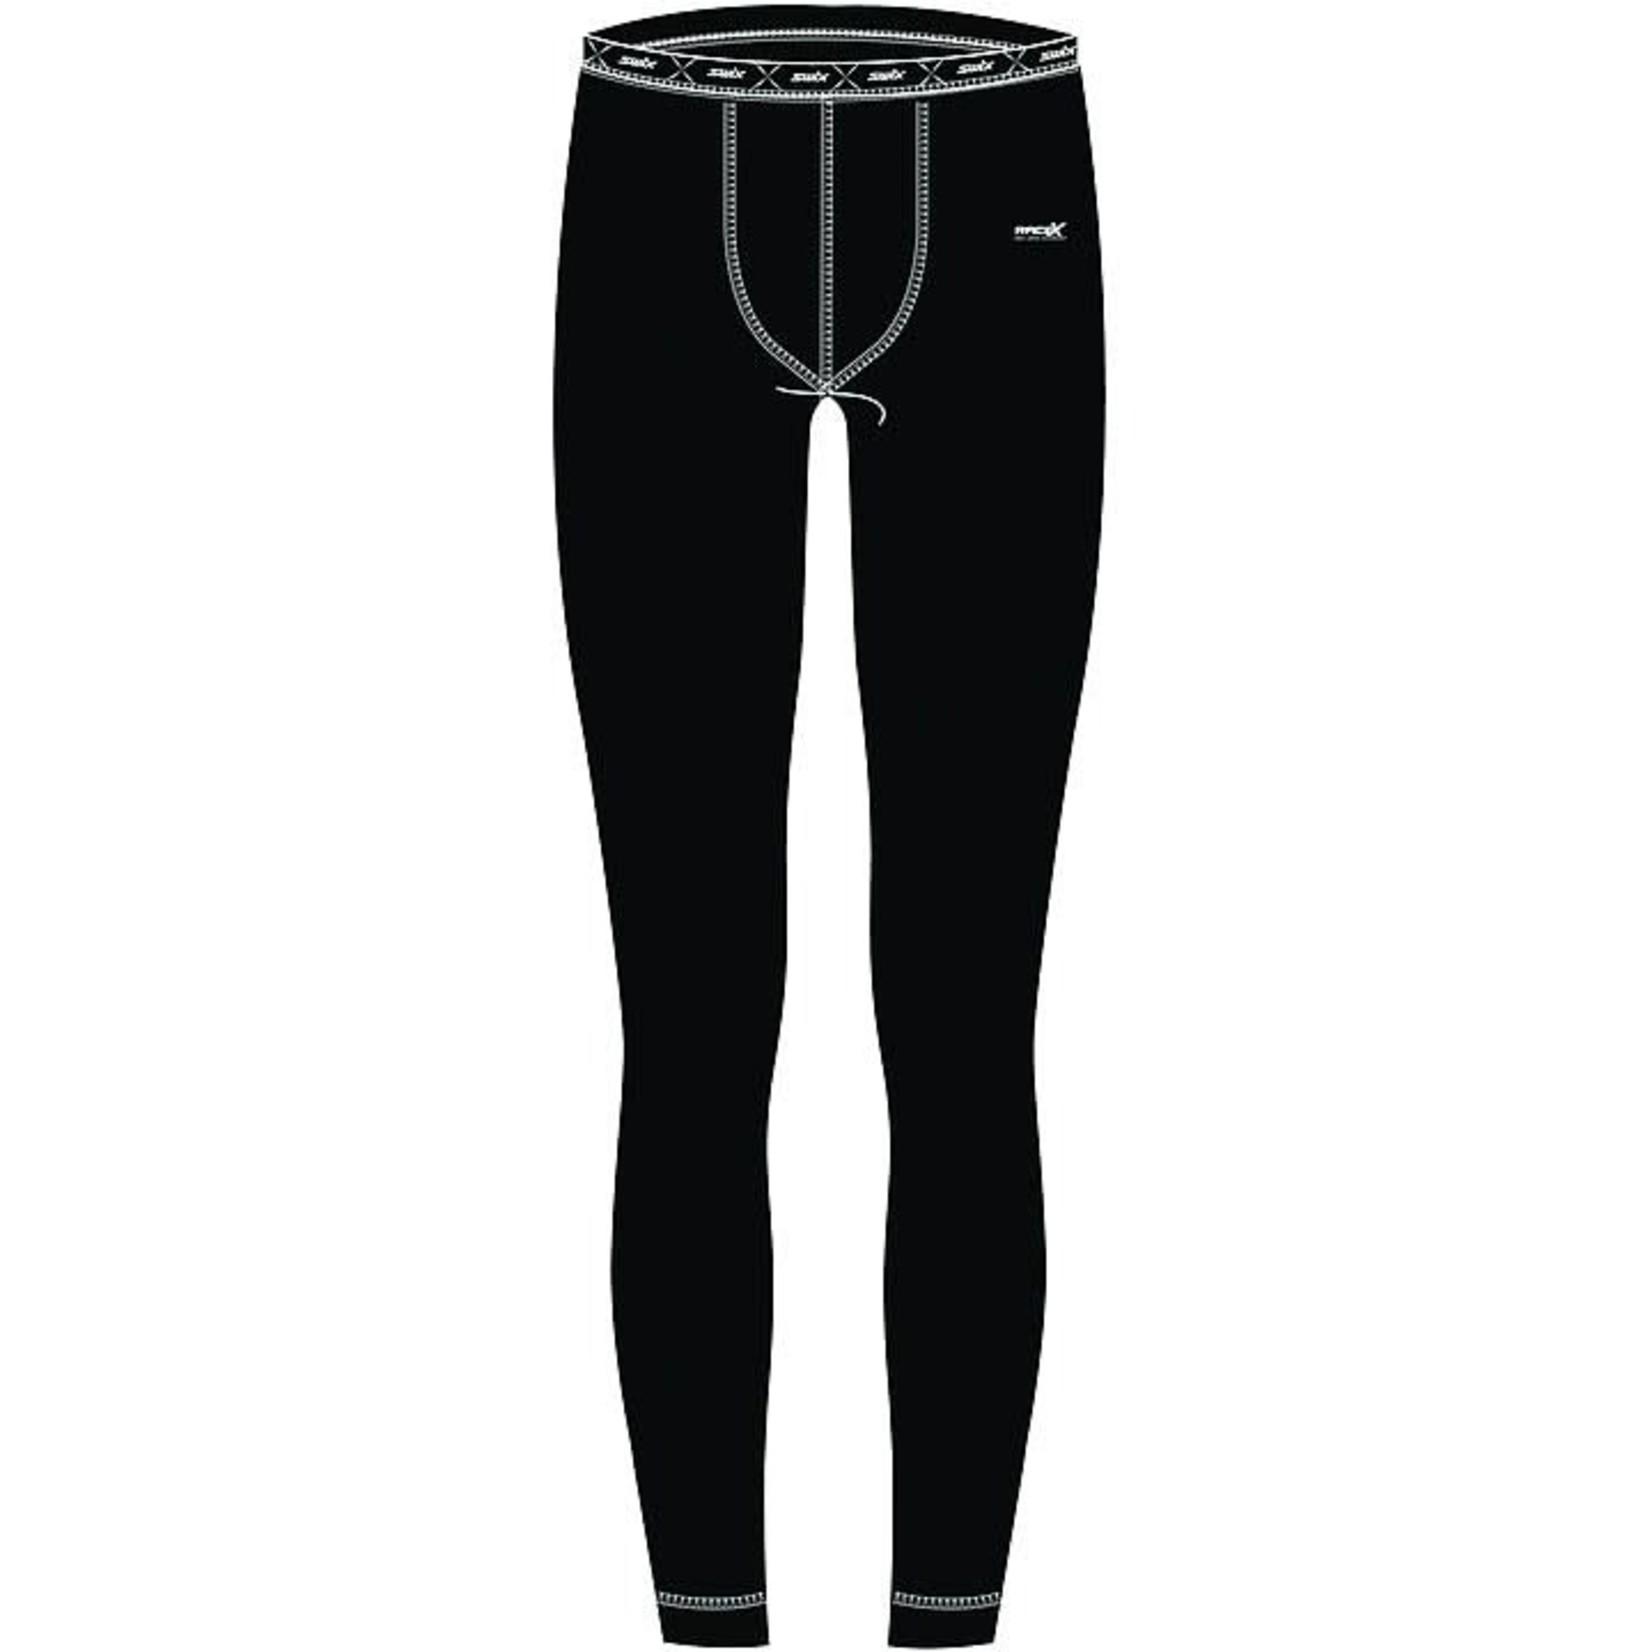 Swix Swix RaceX Warm Body Baselayer Pant Men's, Small, Black